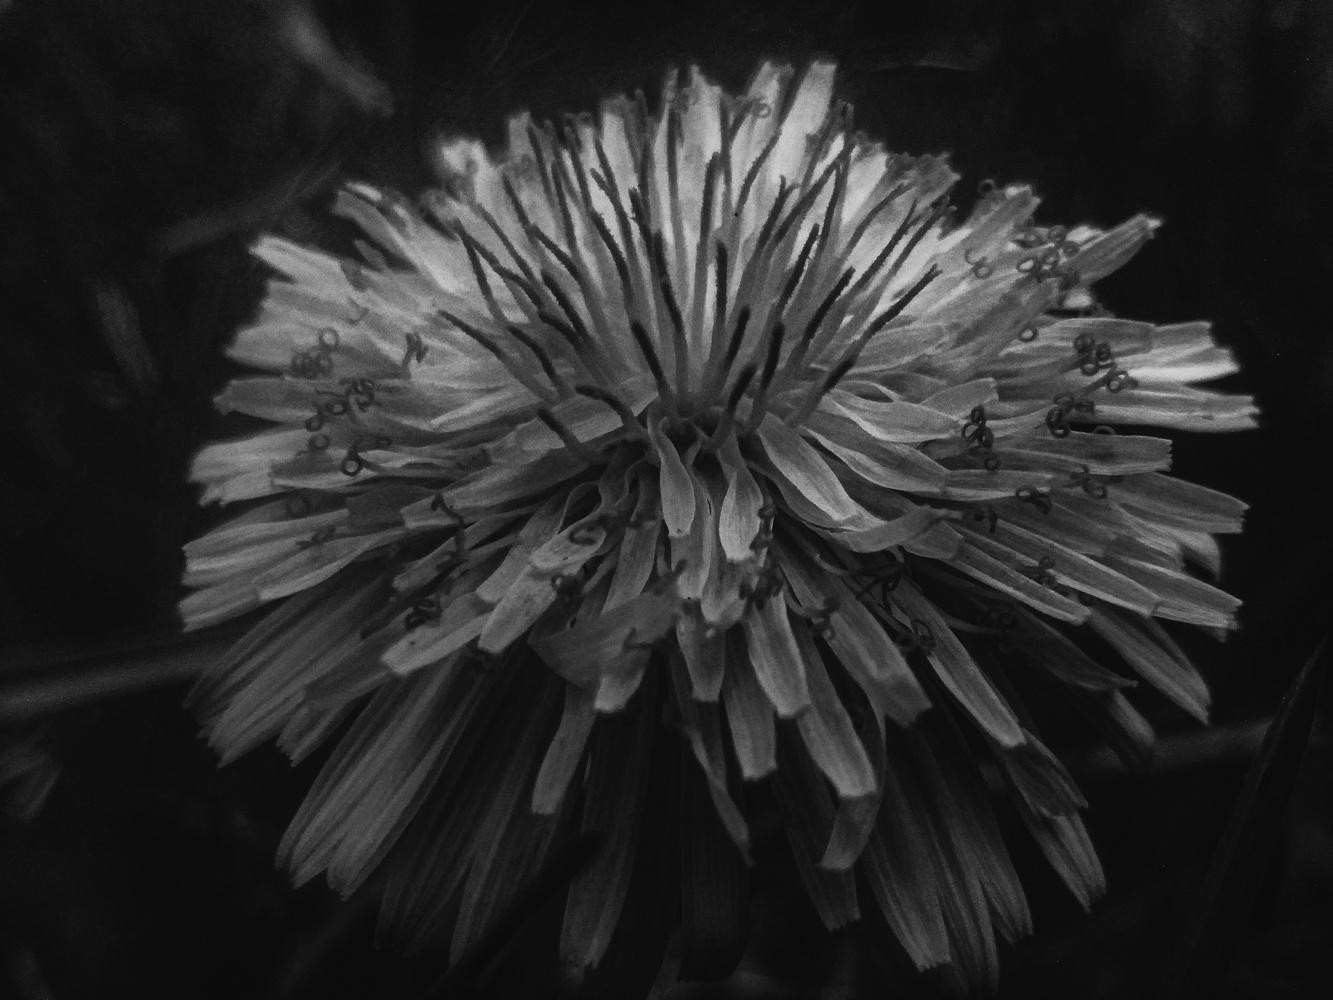 Dandelion B&W by Dijana Kr